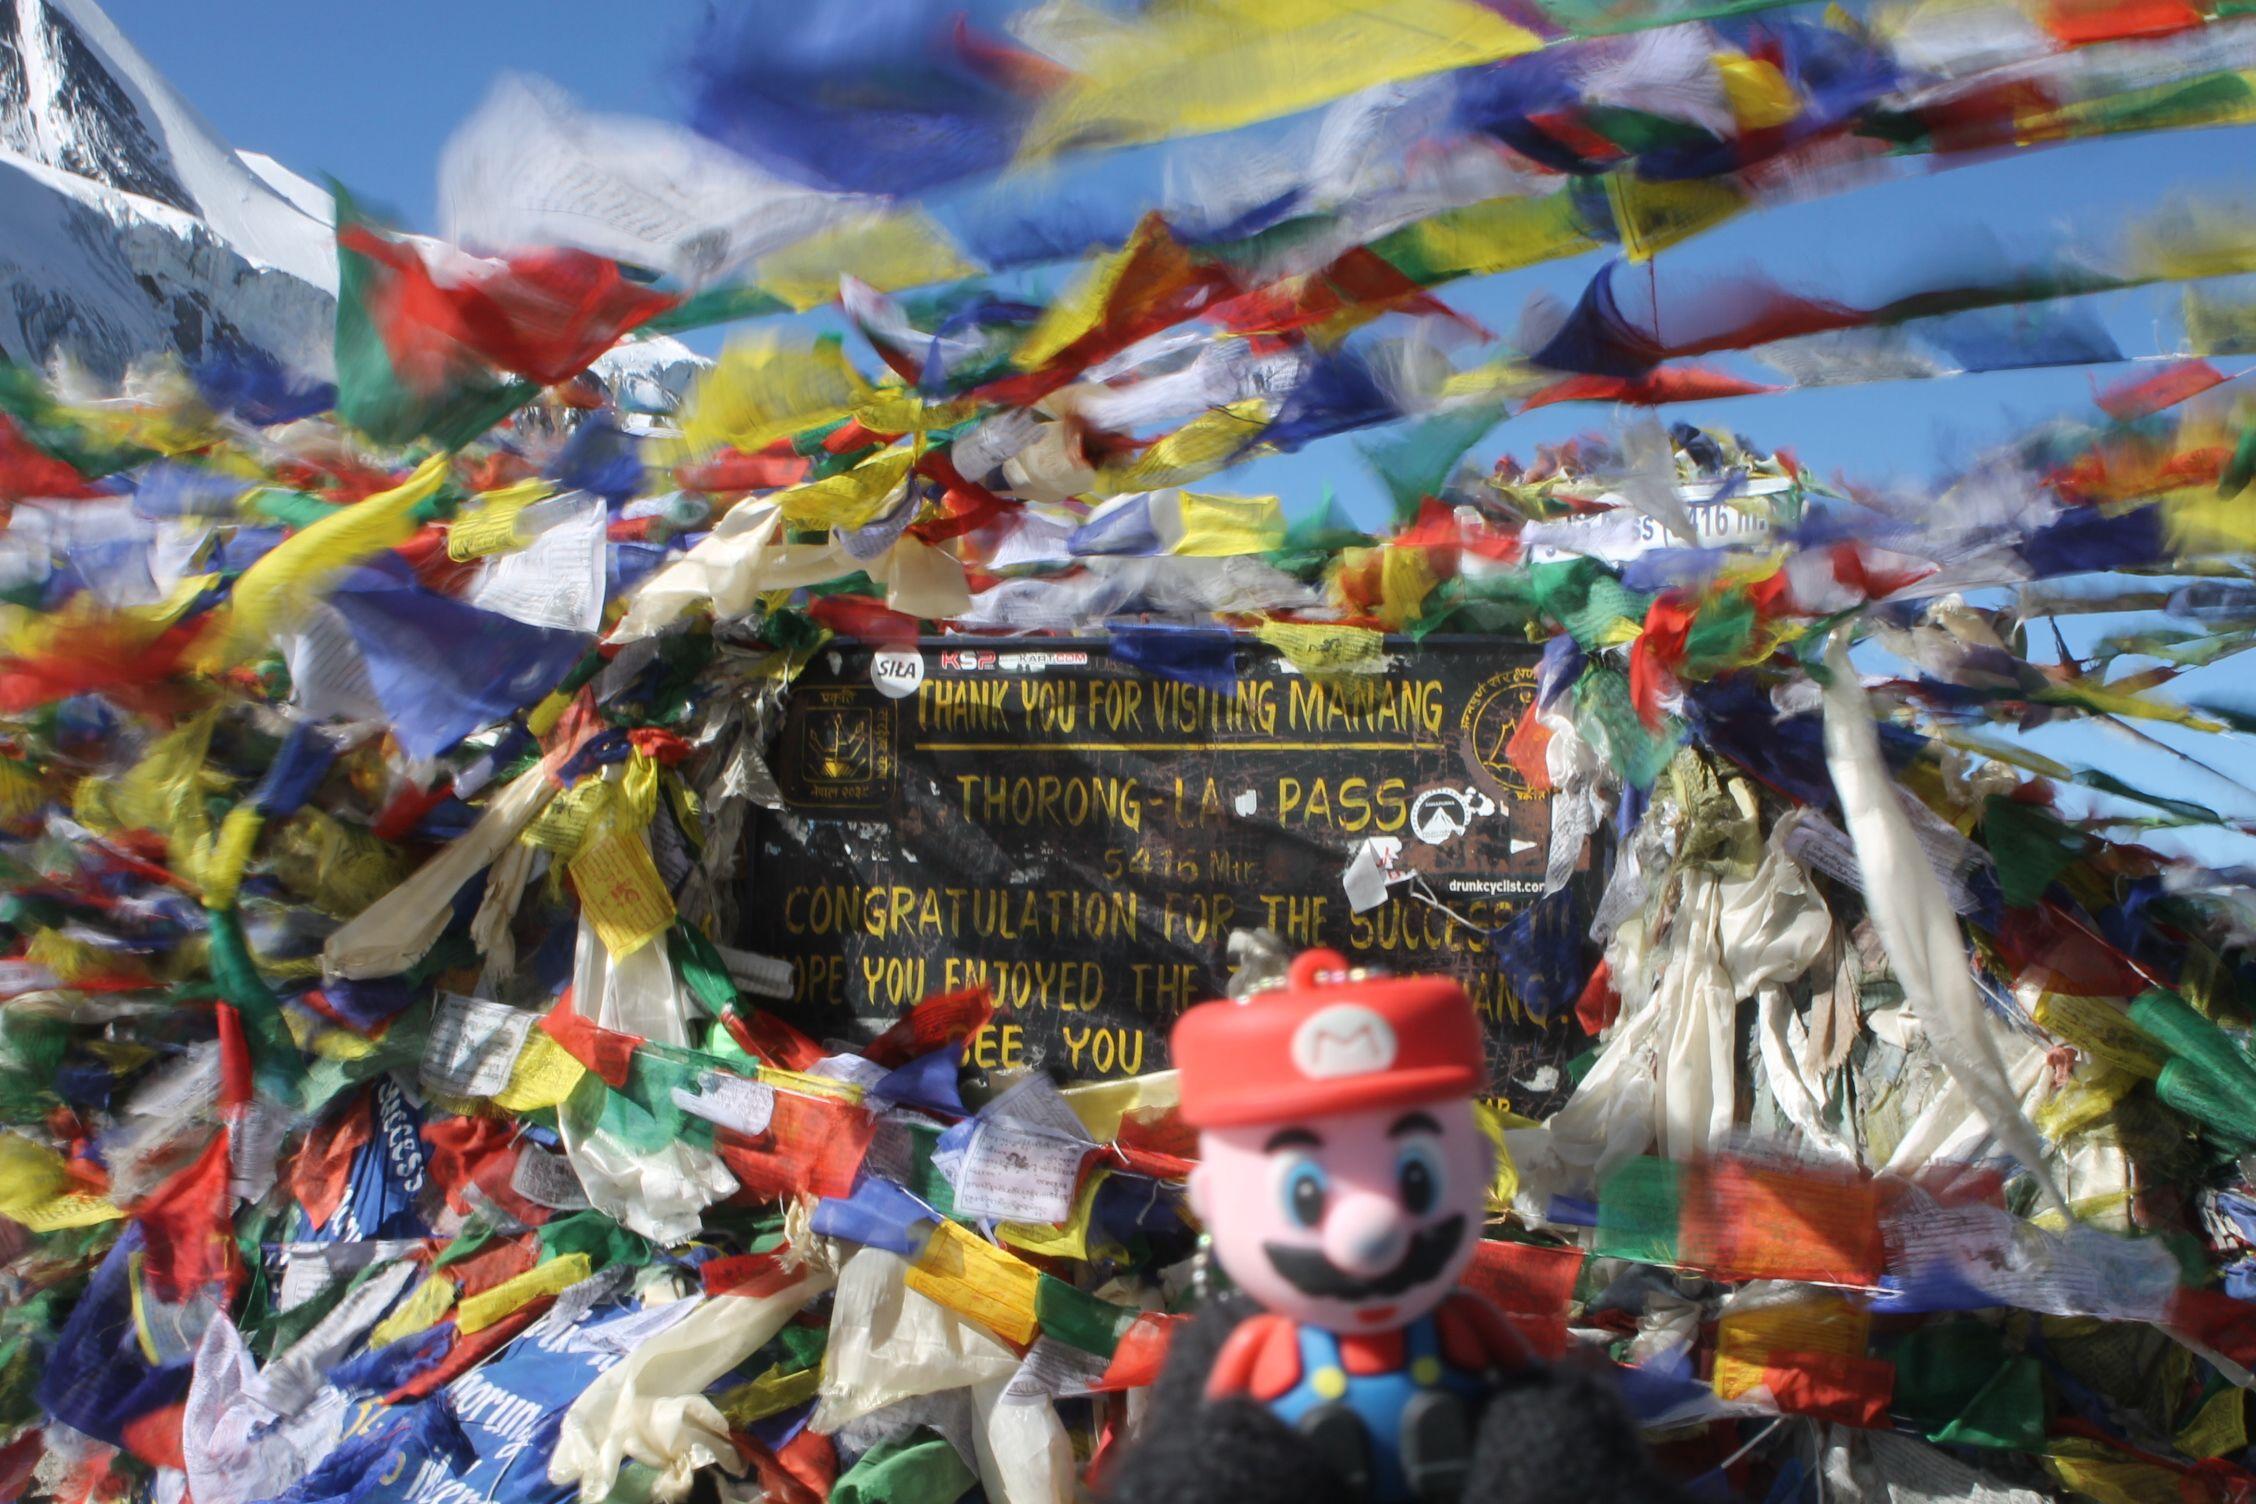 Thorung La Pass, Annapurnas